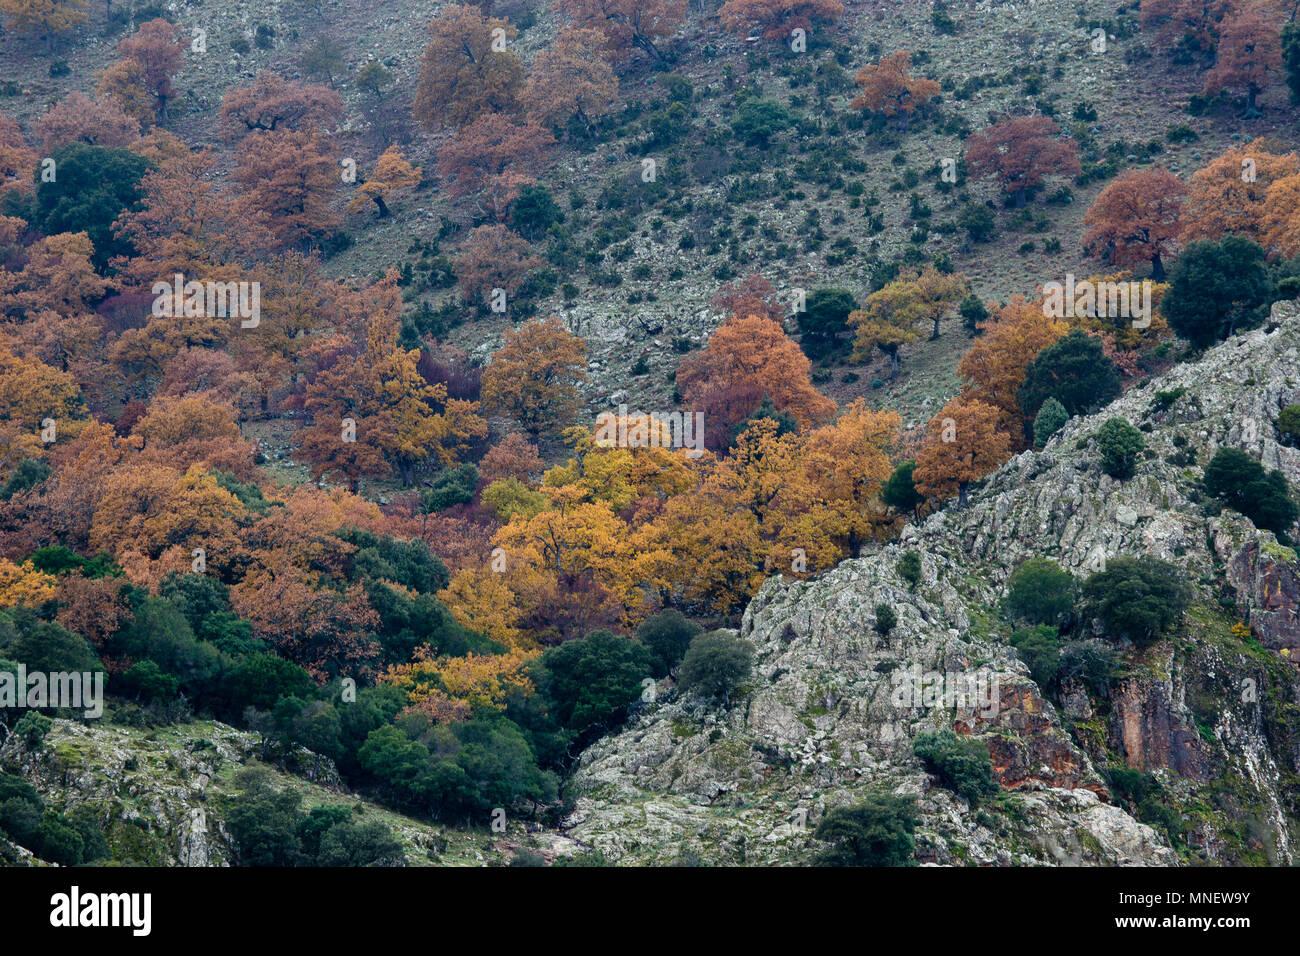 Sardegna; Gennargentu; Inverno; Parco del Gennargentu; Immagini Stock